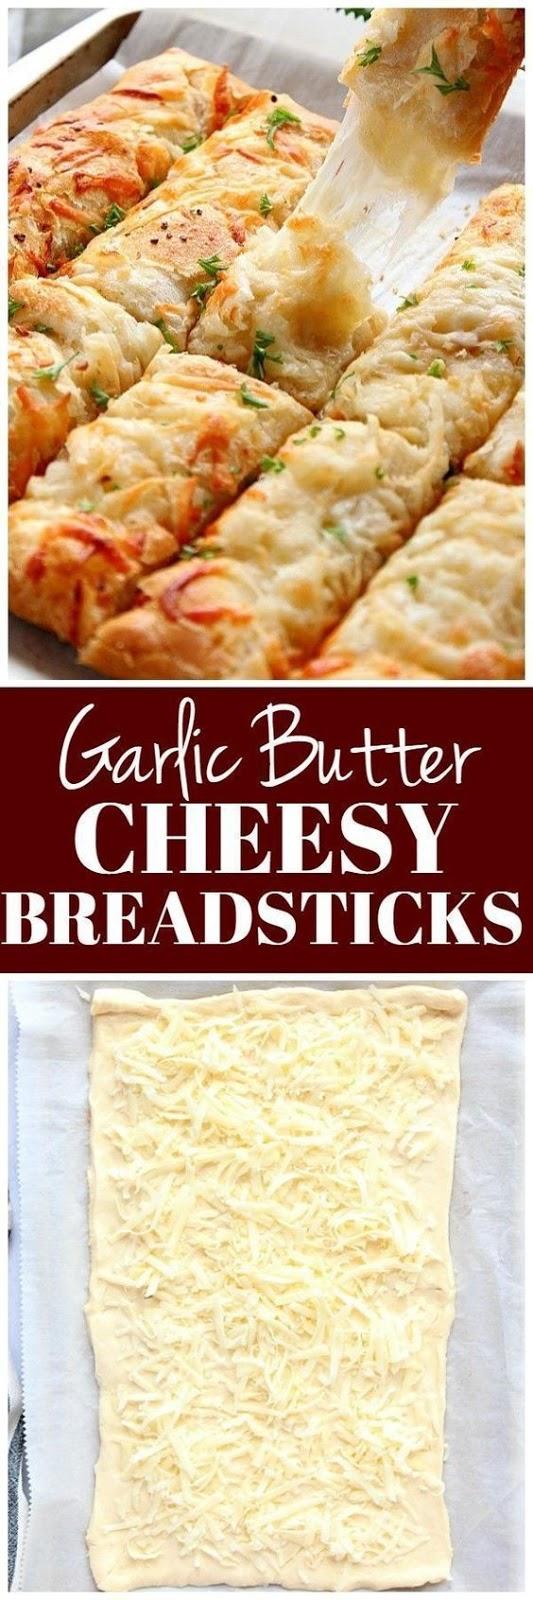 Garlic Butter Cheesy Breadsticks Recipe